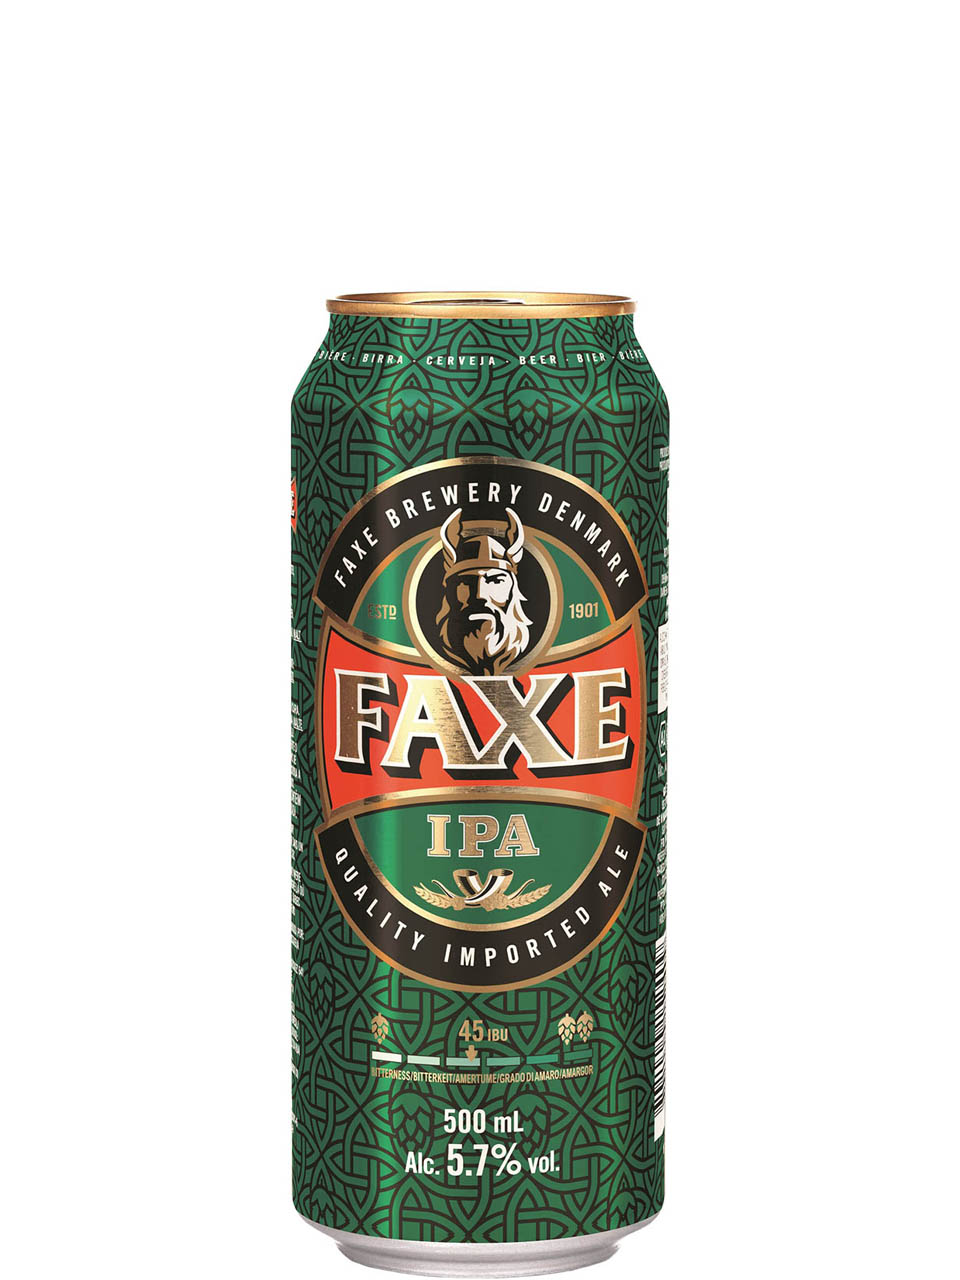 Faxe IPA 500ml Can